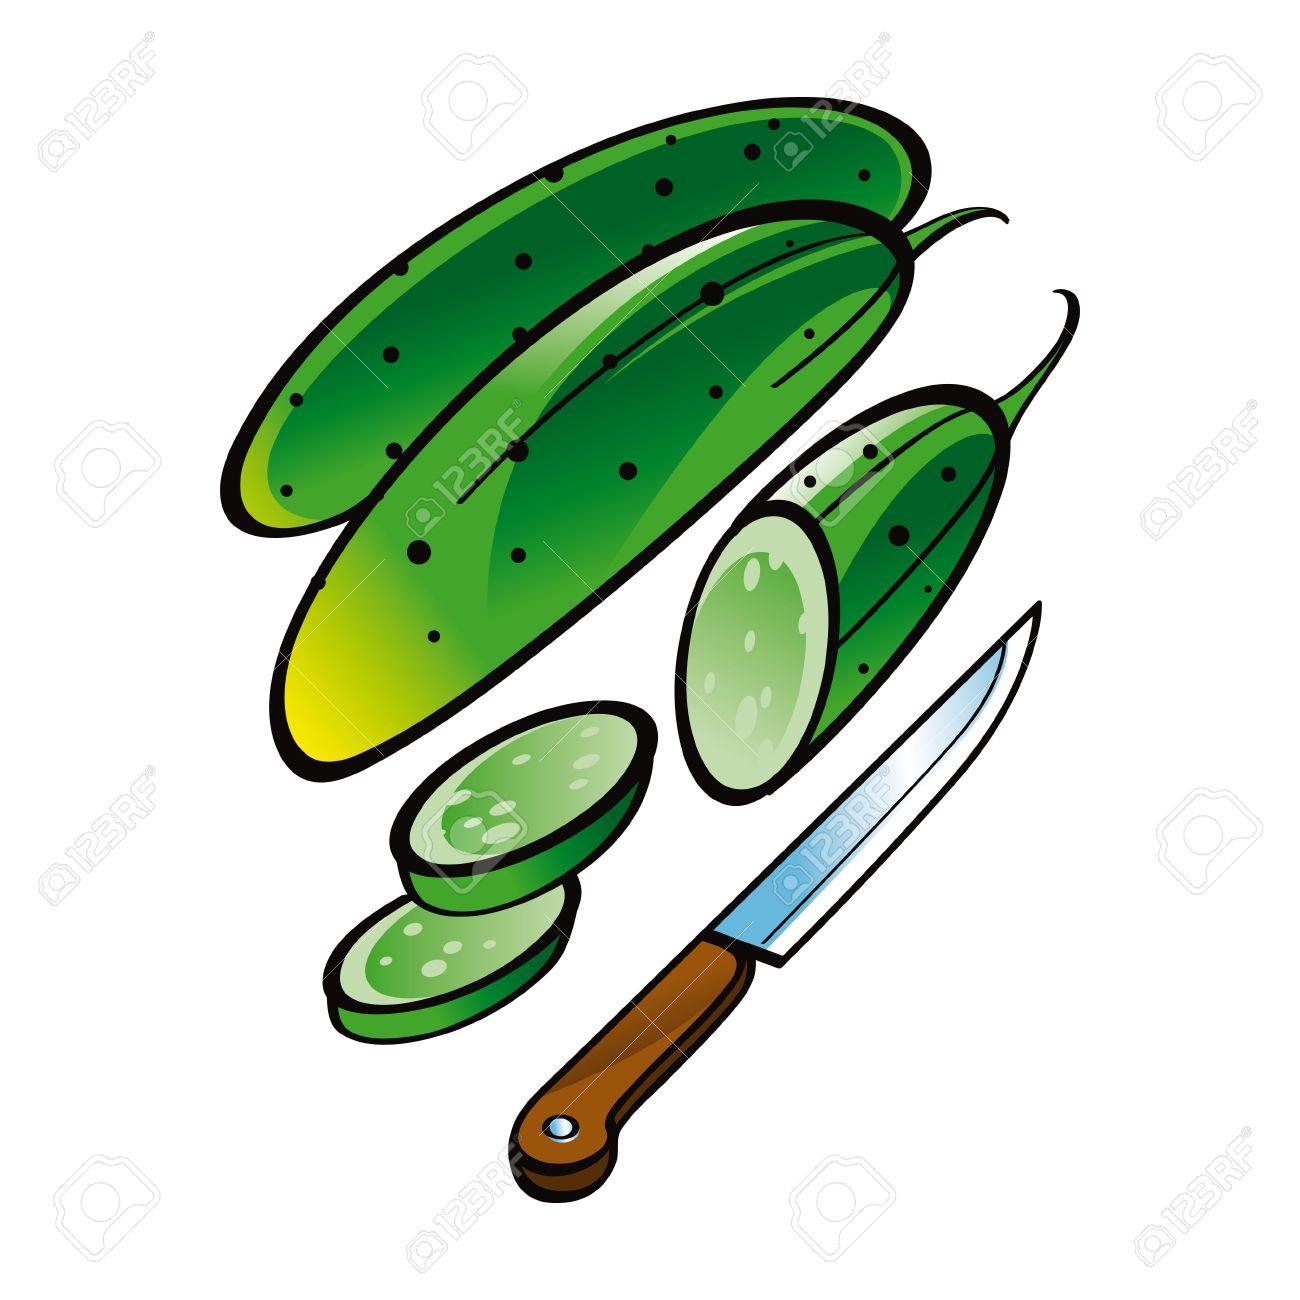 Juicy Fresh Vegetable Cucumber With Knife Food Market Garden.